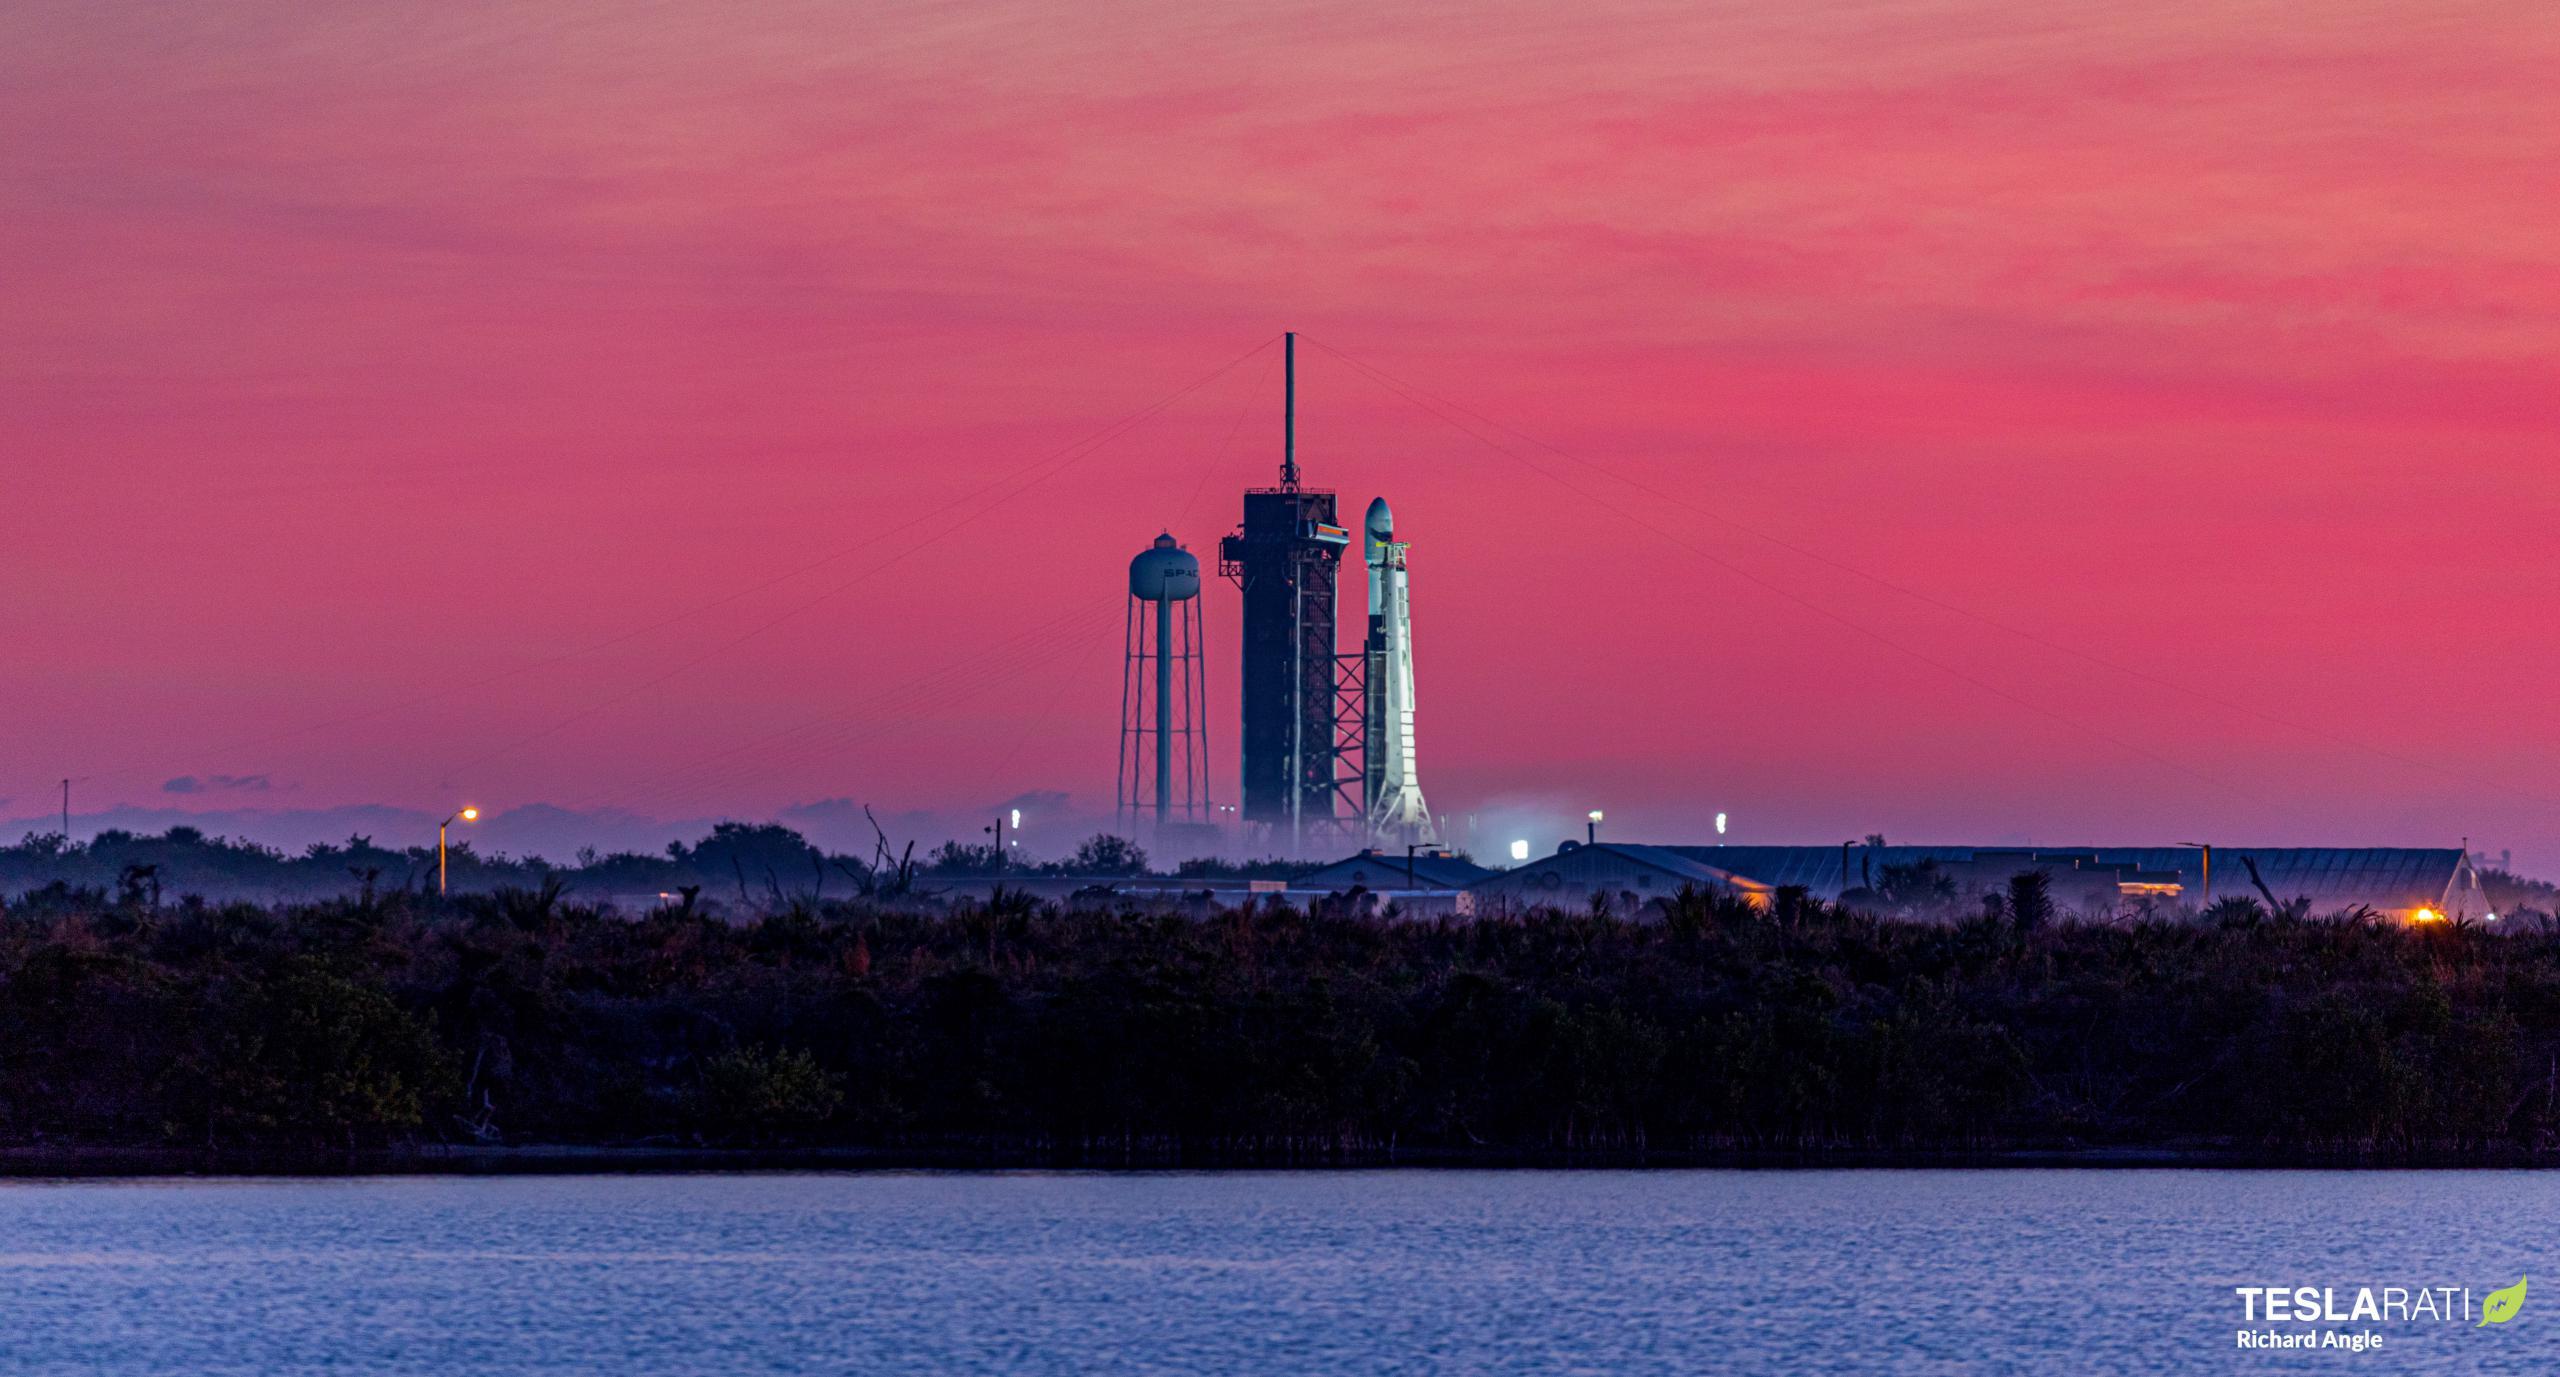 Starlink-16 Falcon 9 B1051 39A 012021 (Richard Angle) sunrise 1 (c)